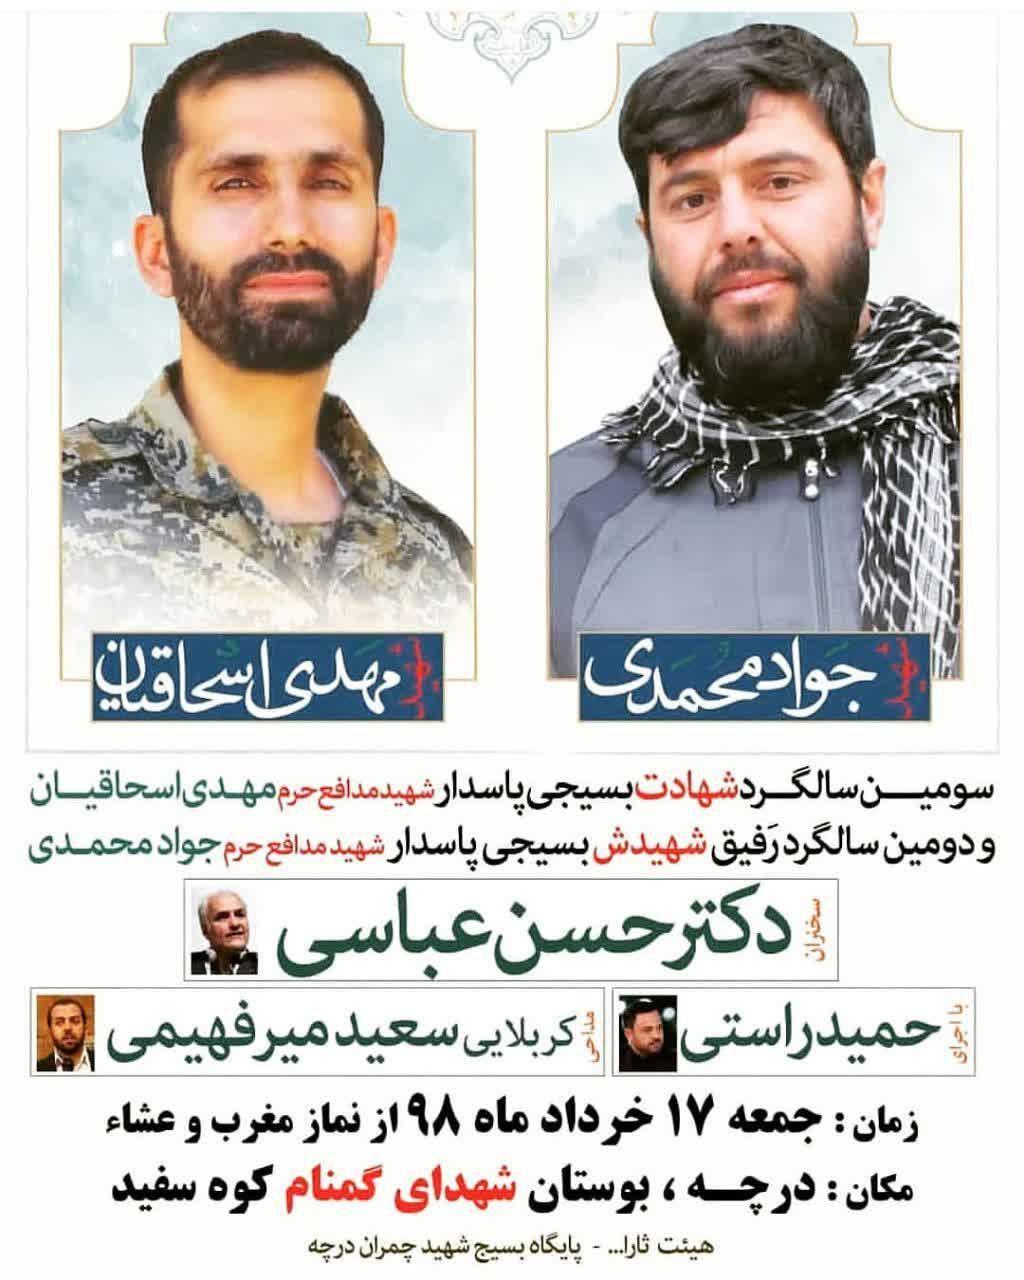 photo 2019 06 17 11 13 29 ۱۷ خرداد ۹۸؛ سخنرانی استاد حسن عباسی در اصفهان